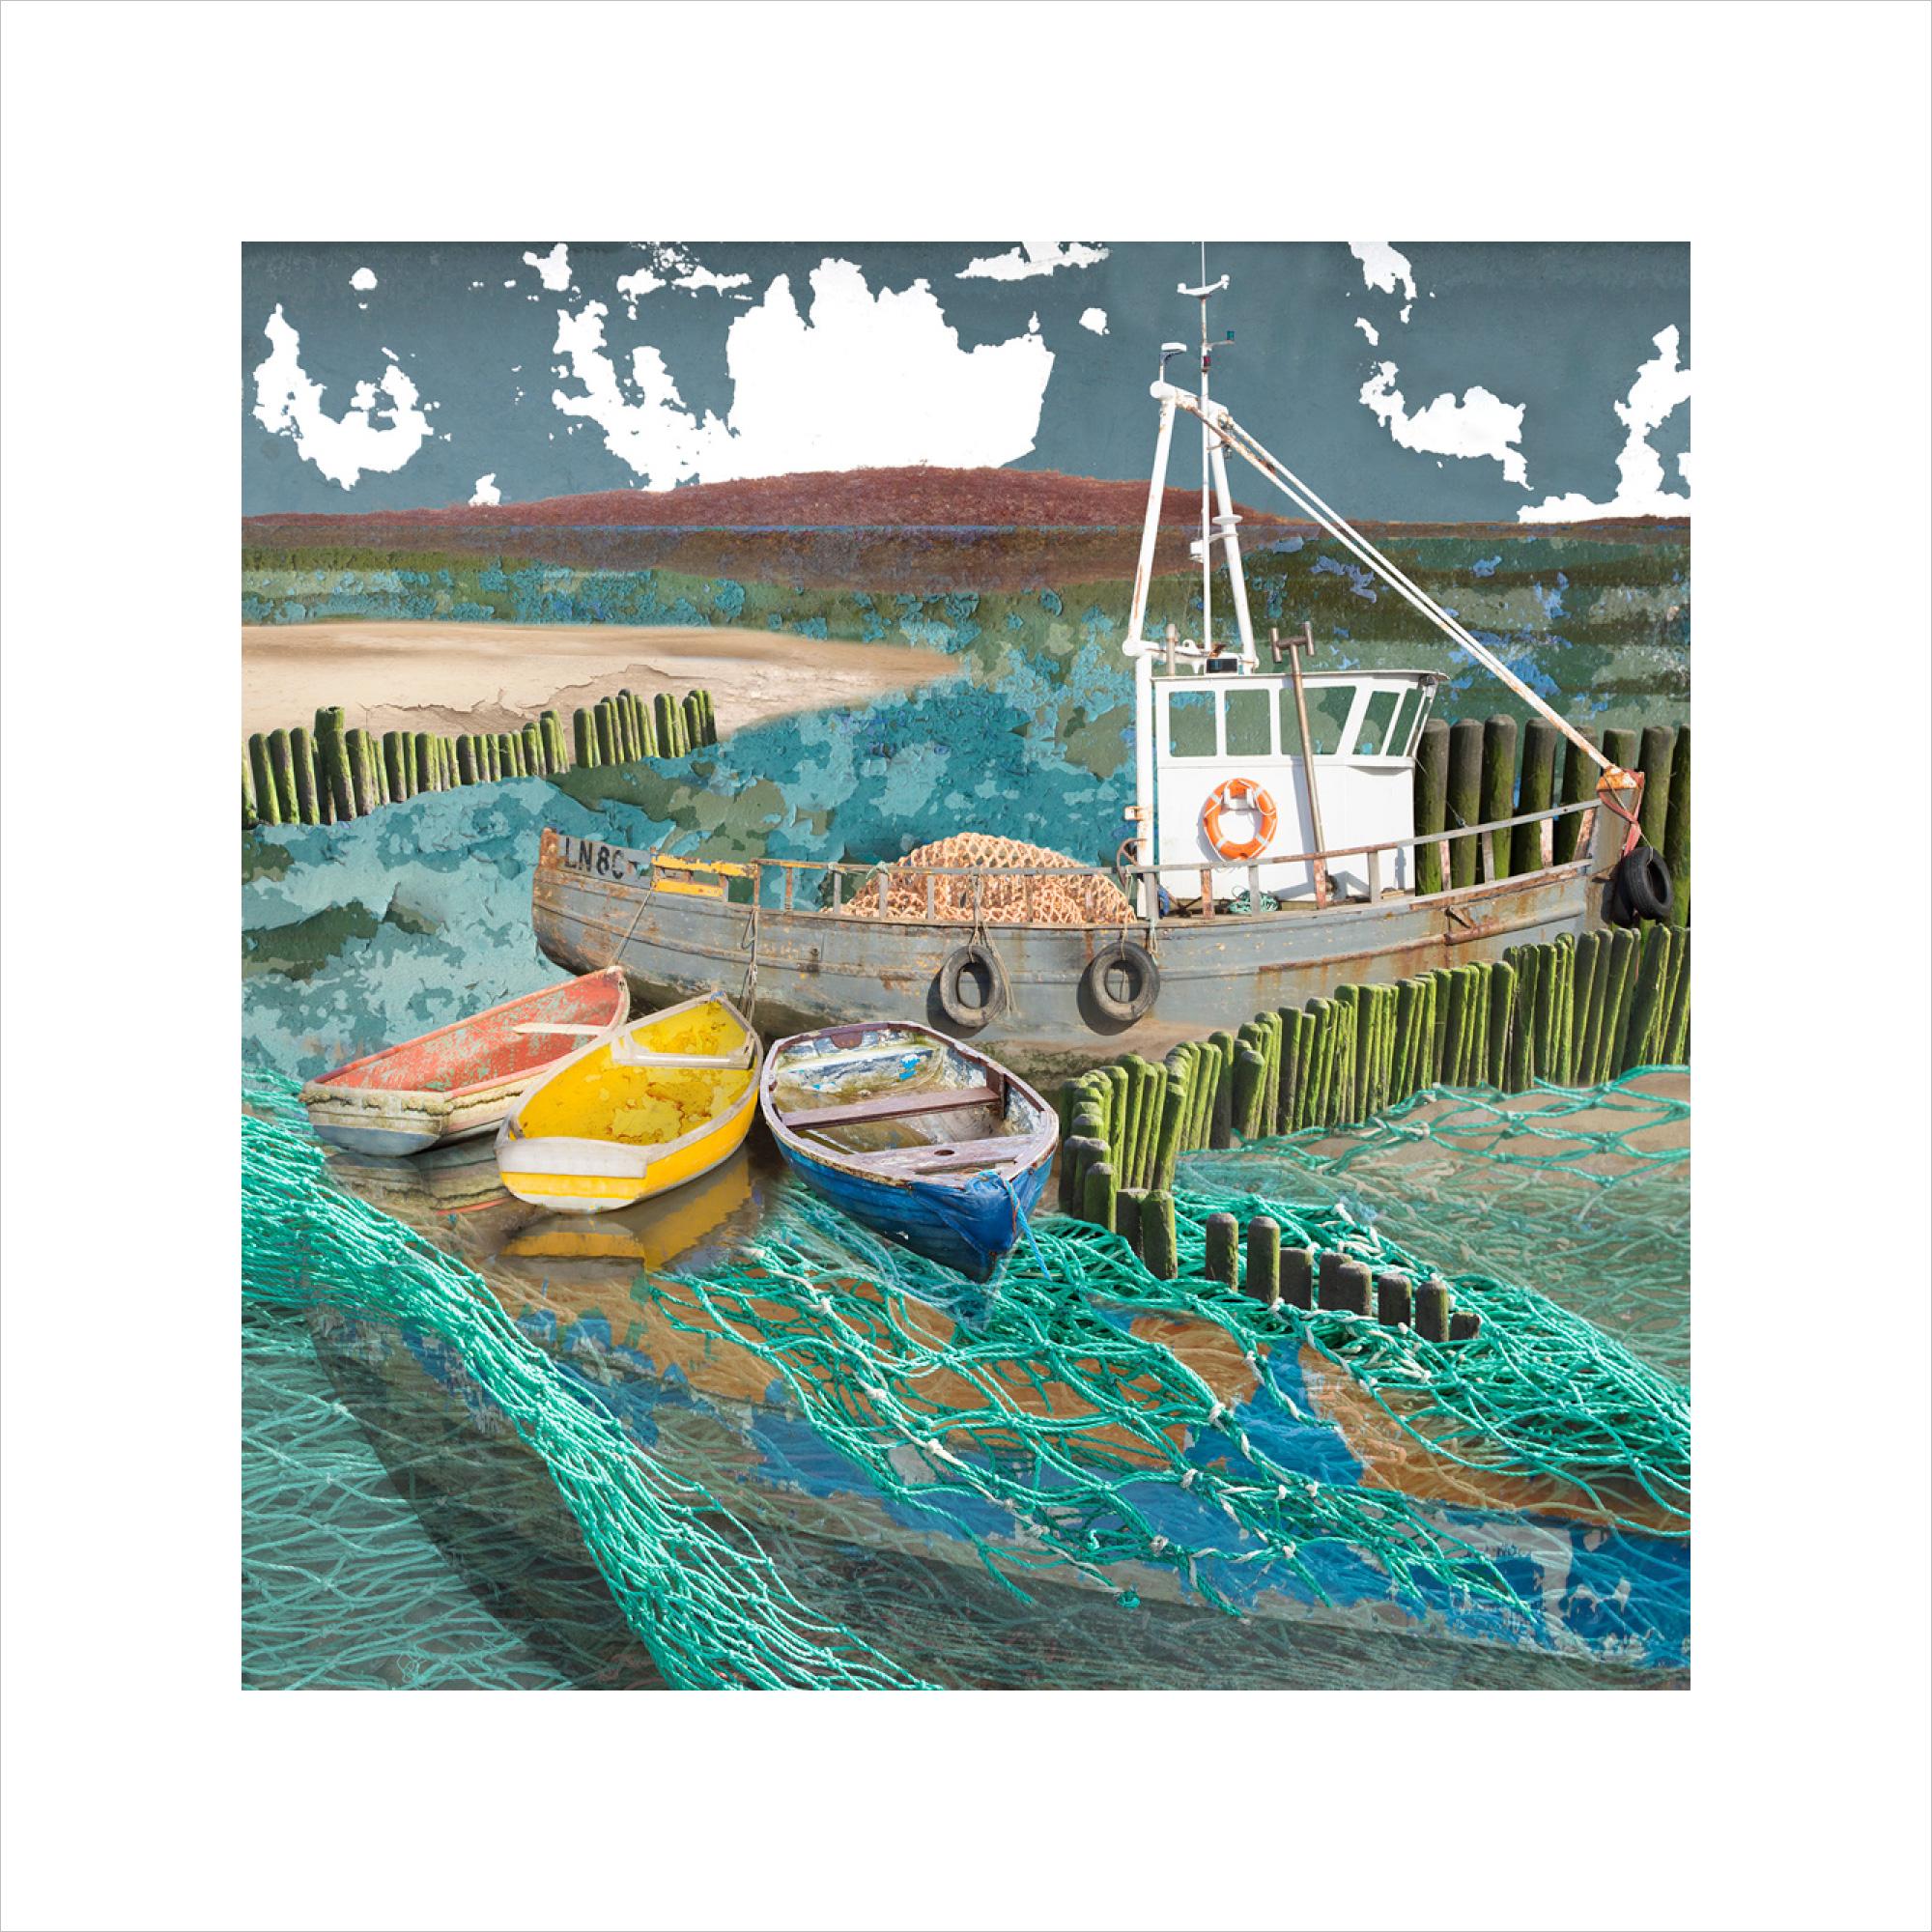 Claire Gill, Artist, Limited Edition prints, photomontage, digital art, seascapes, fine art prints, Staithe, Norfolk